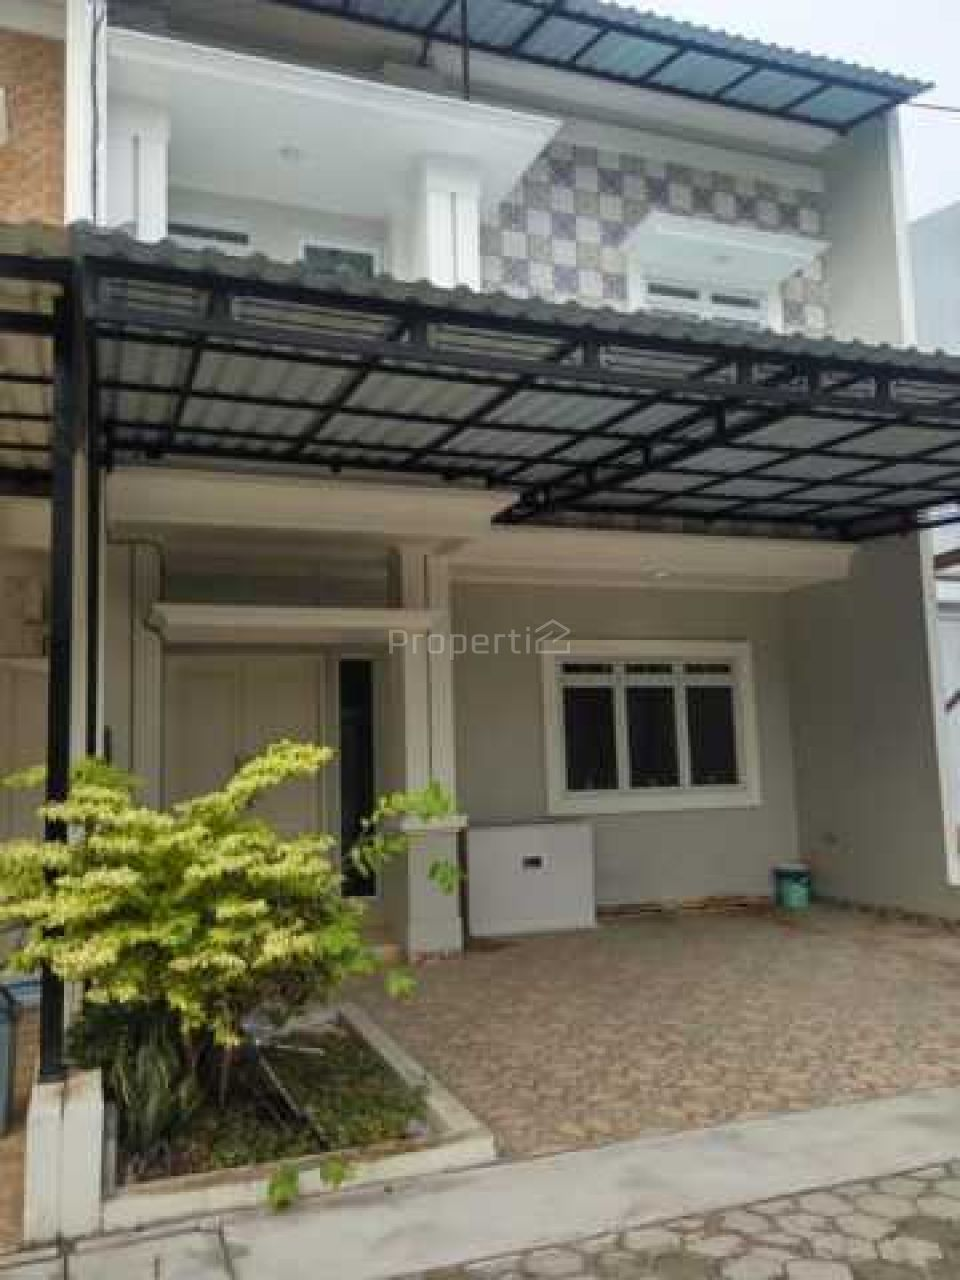 Rumah Baru Semi Furnished Siap Huni di Rawamangun, DKI Jakarta